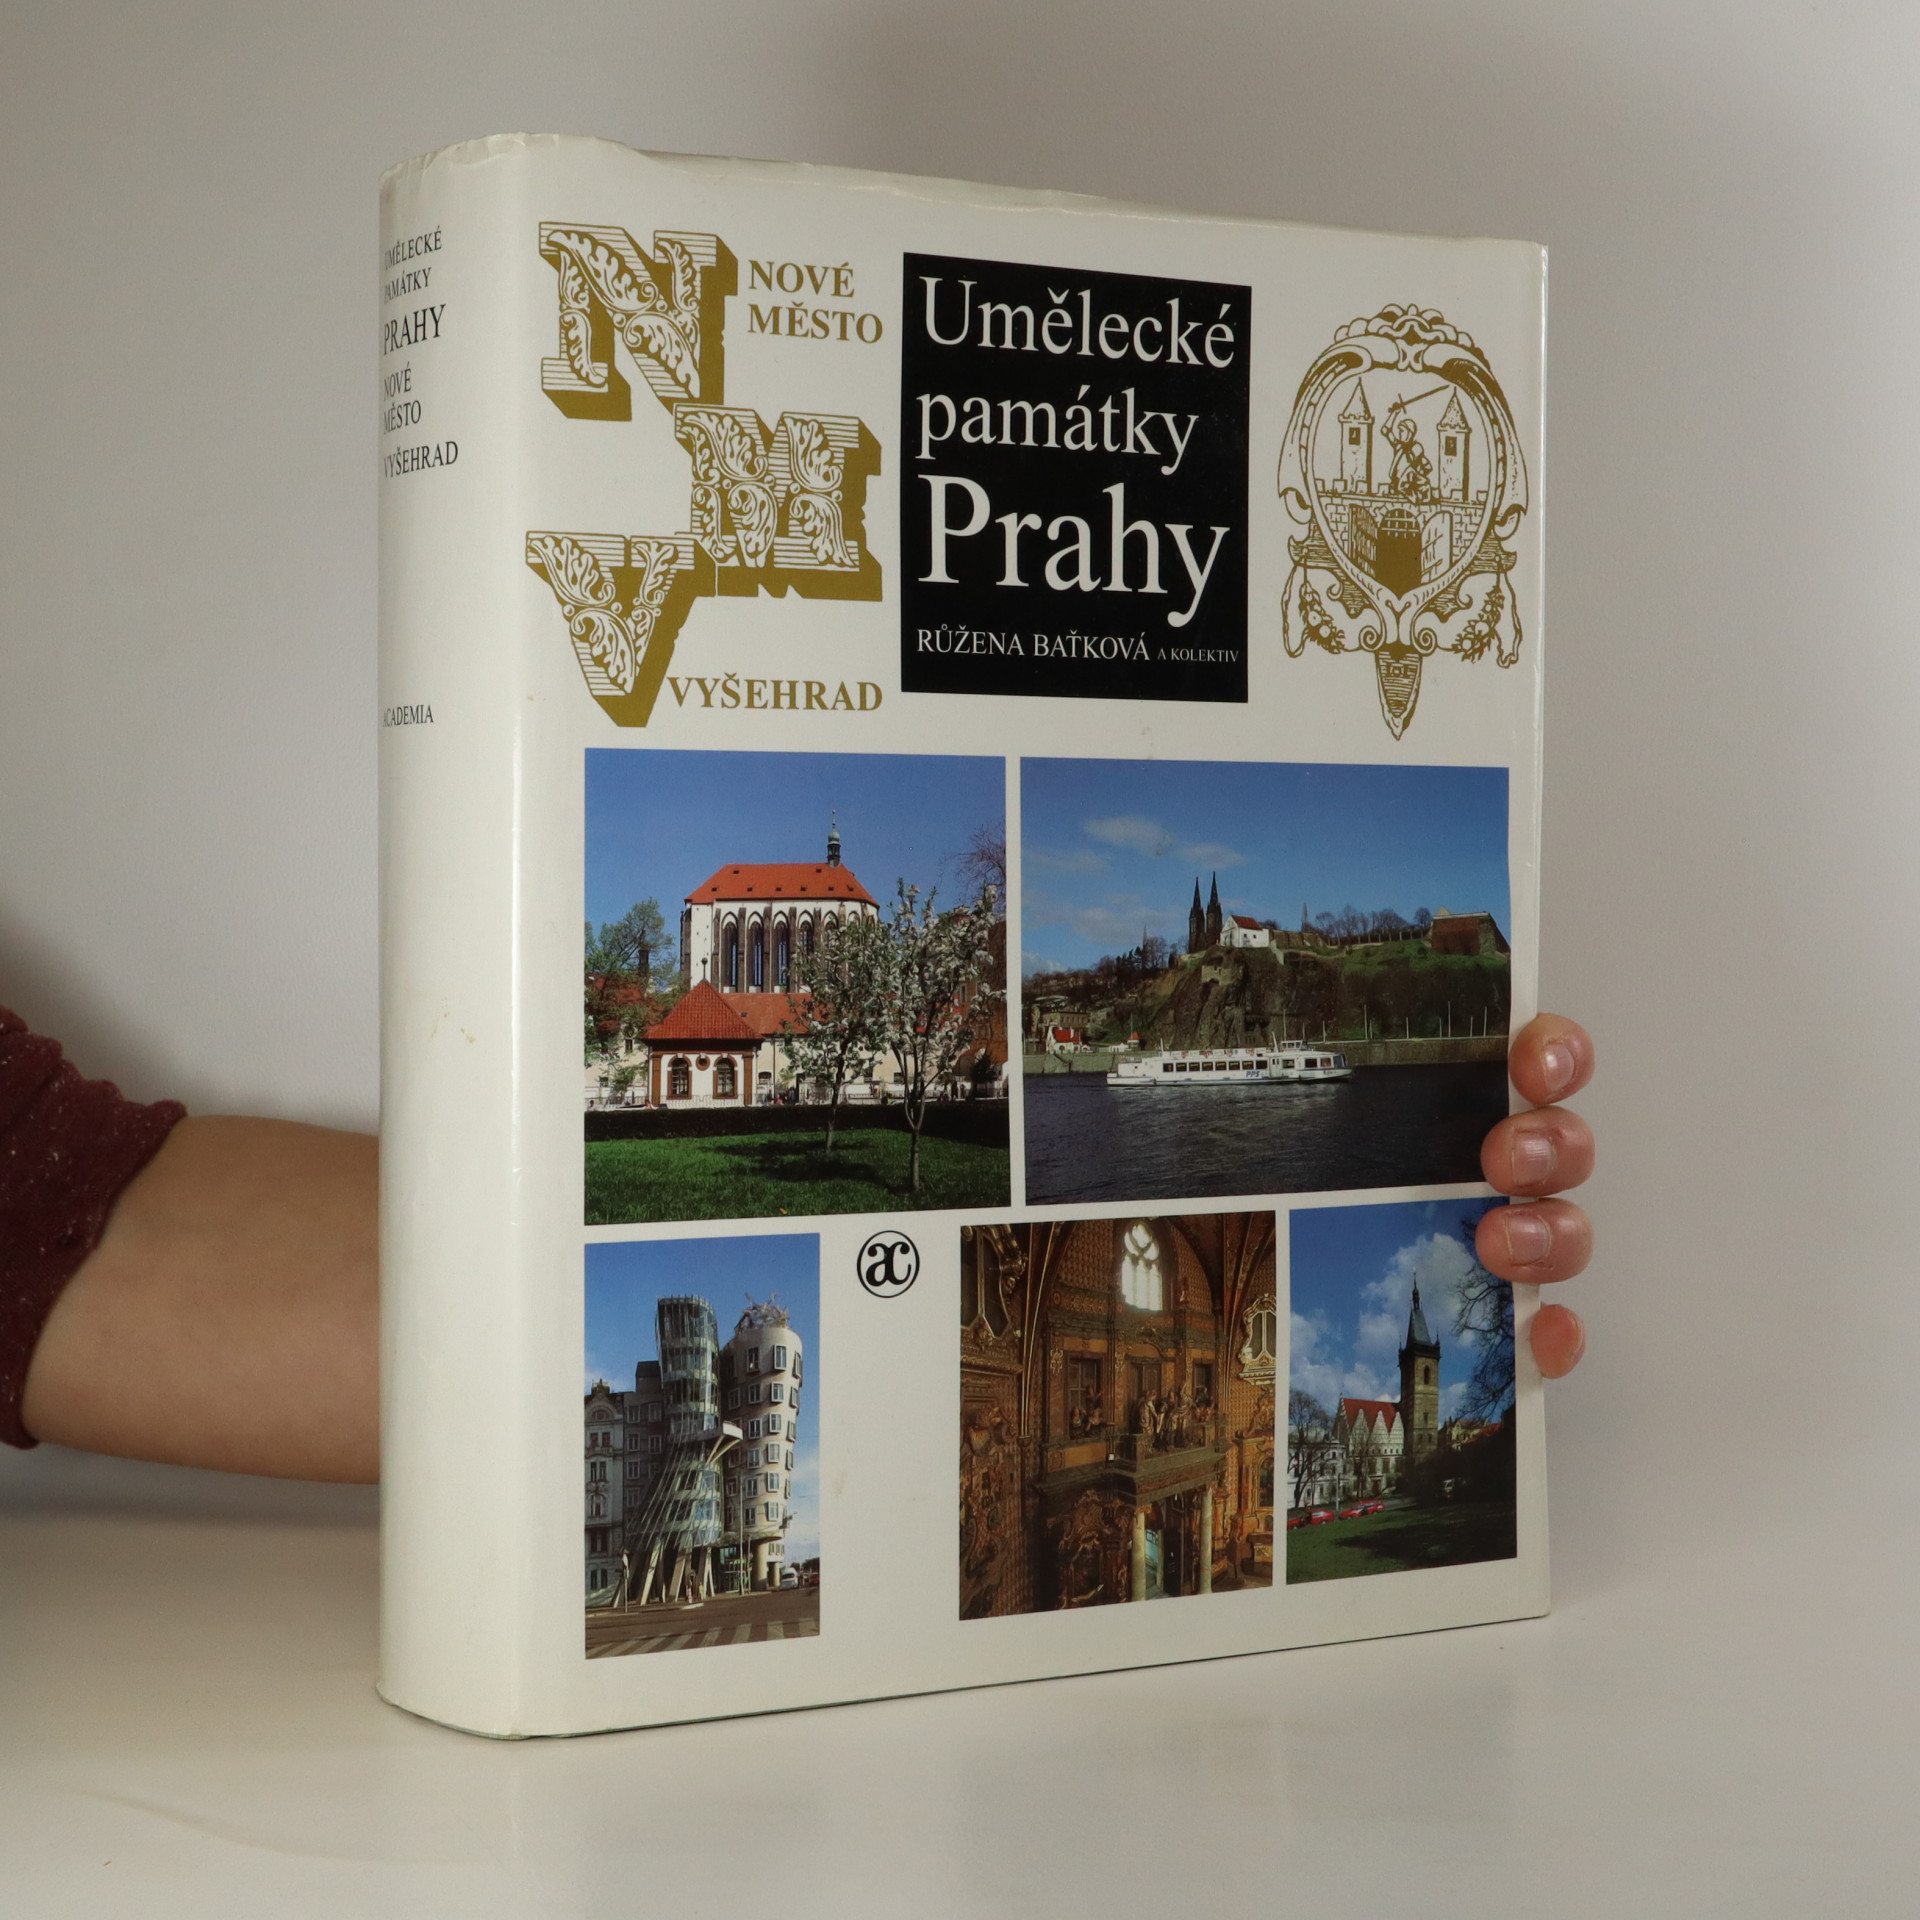 antikvární kniha Umělecké památky Prahy. Nové Město, Vyšehrad, Vinohrady (Praha 1), 1998